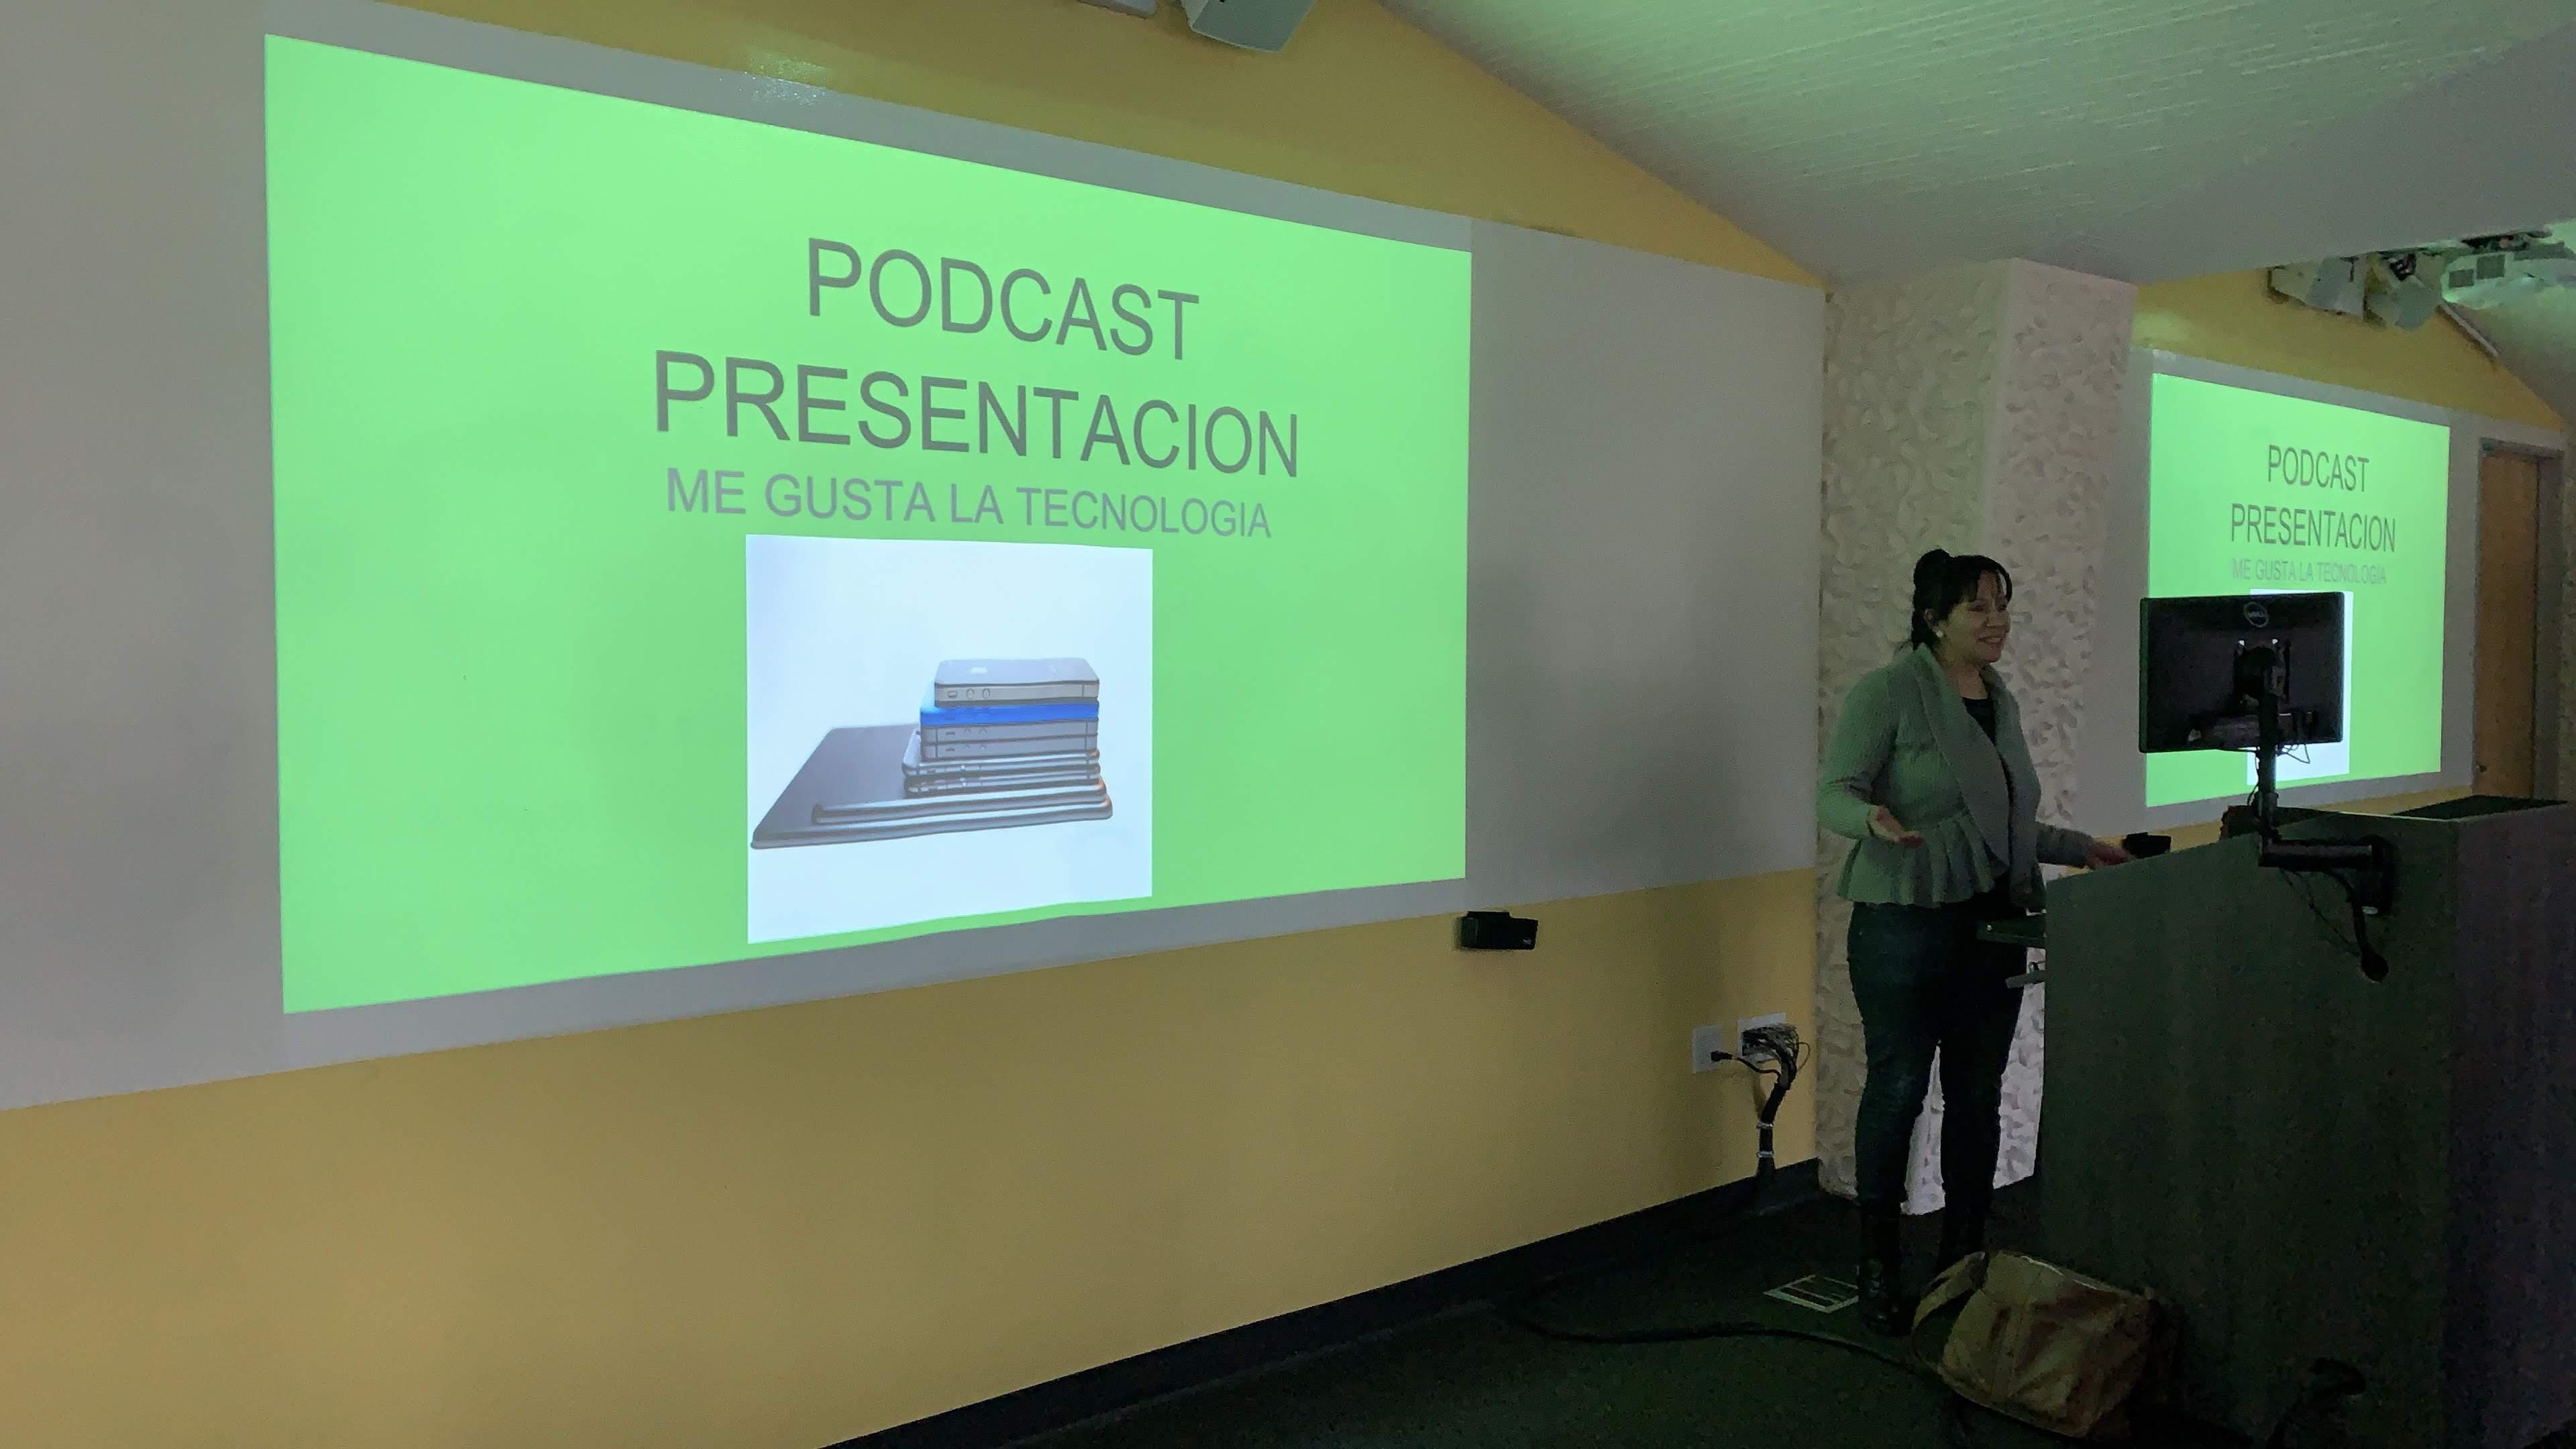 Presentations in class